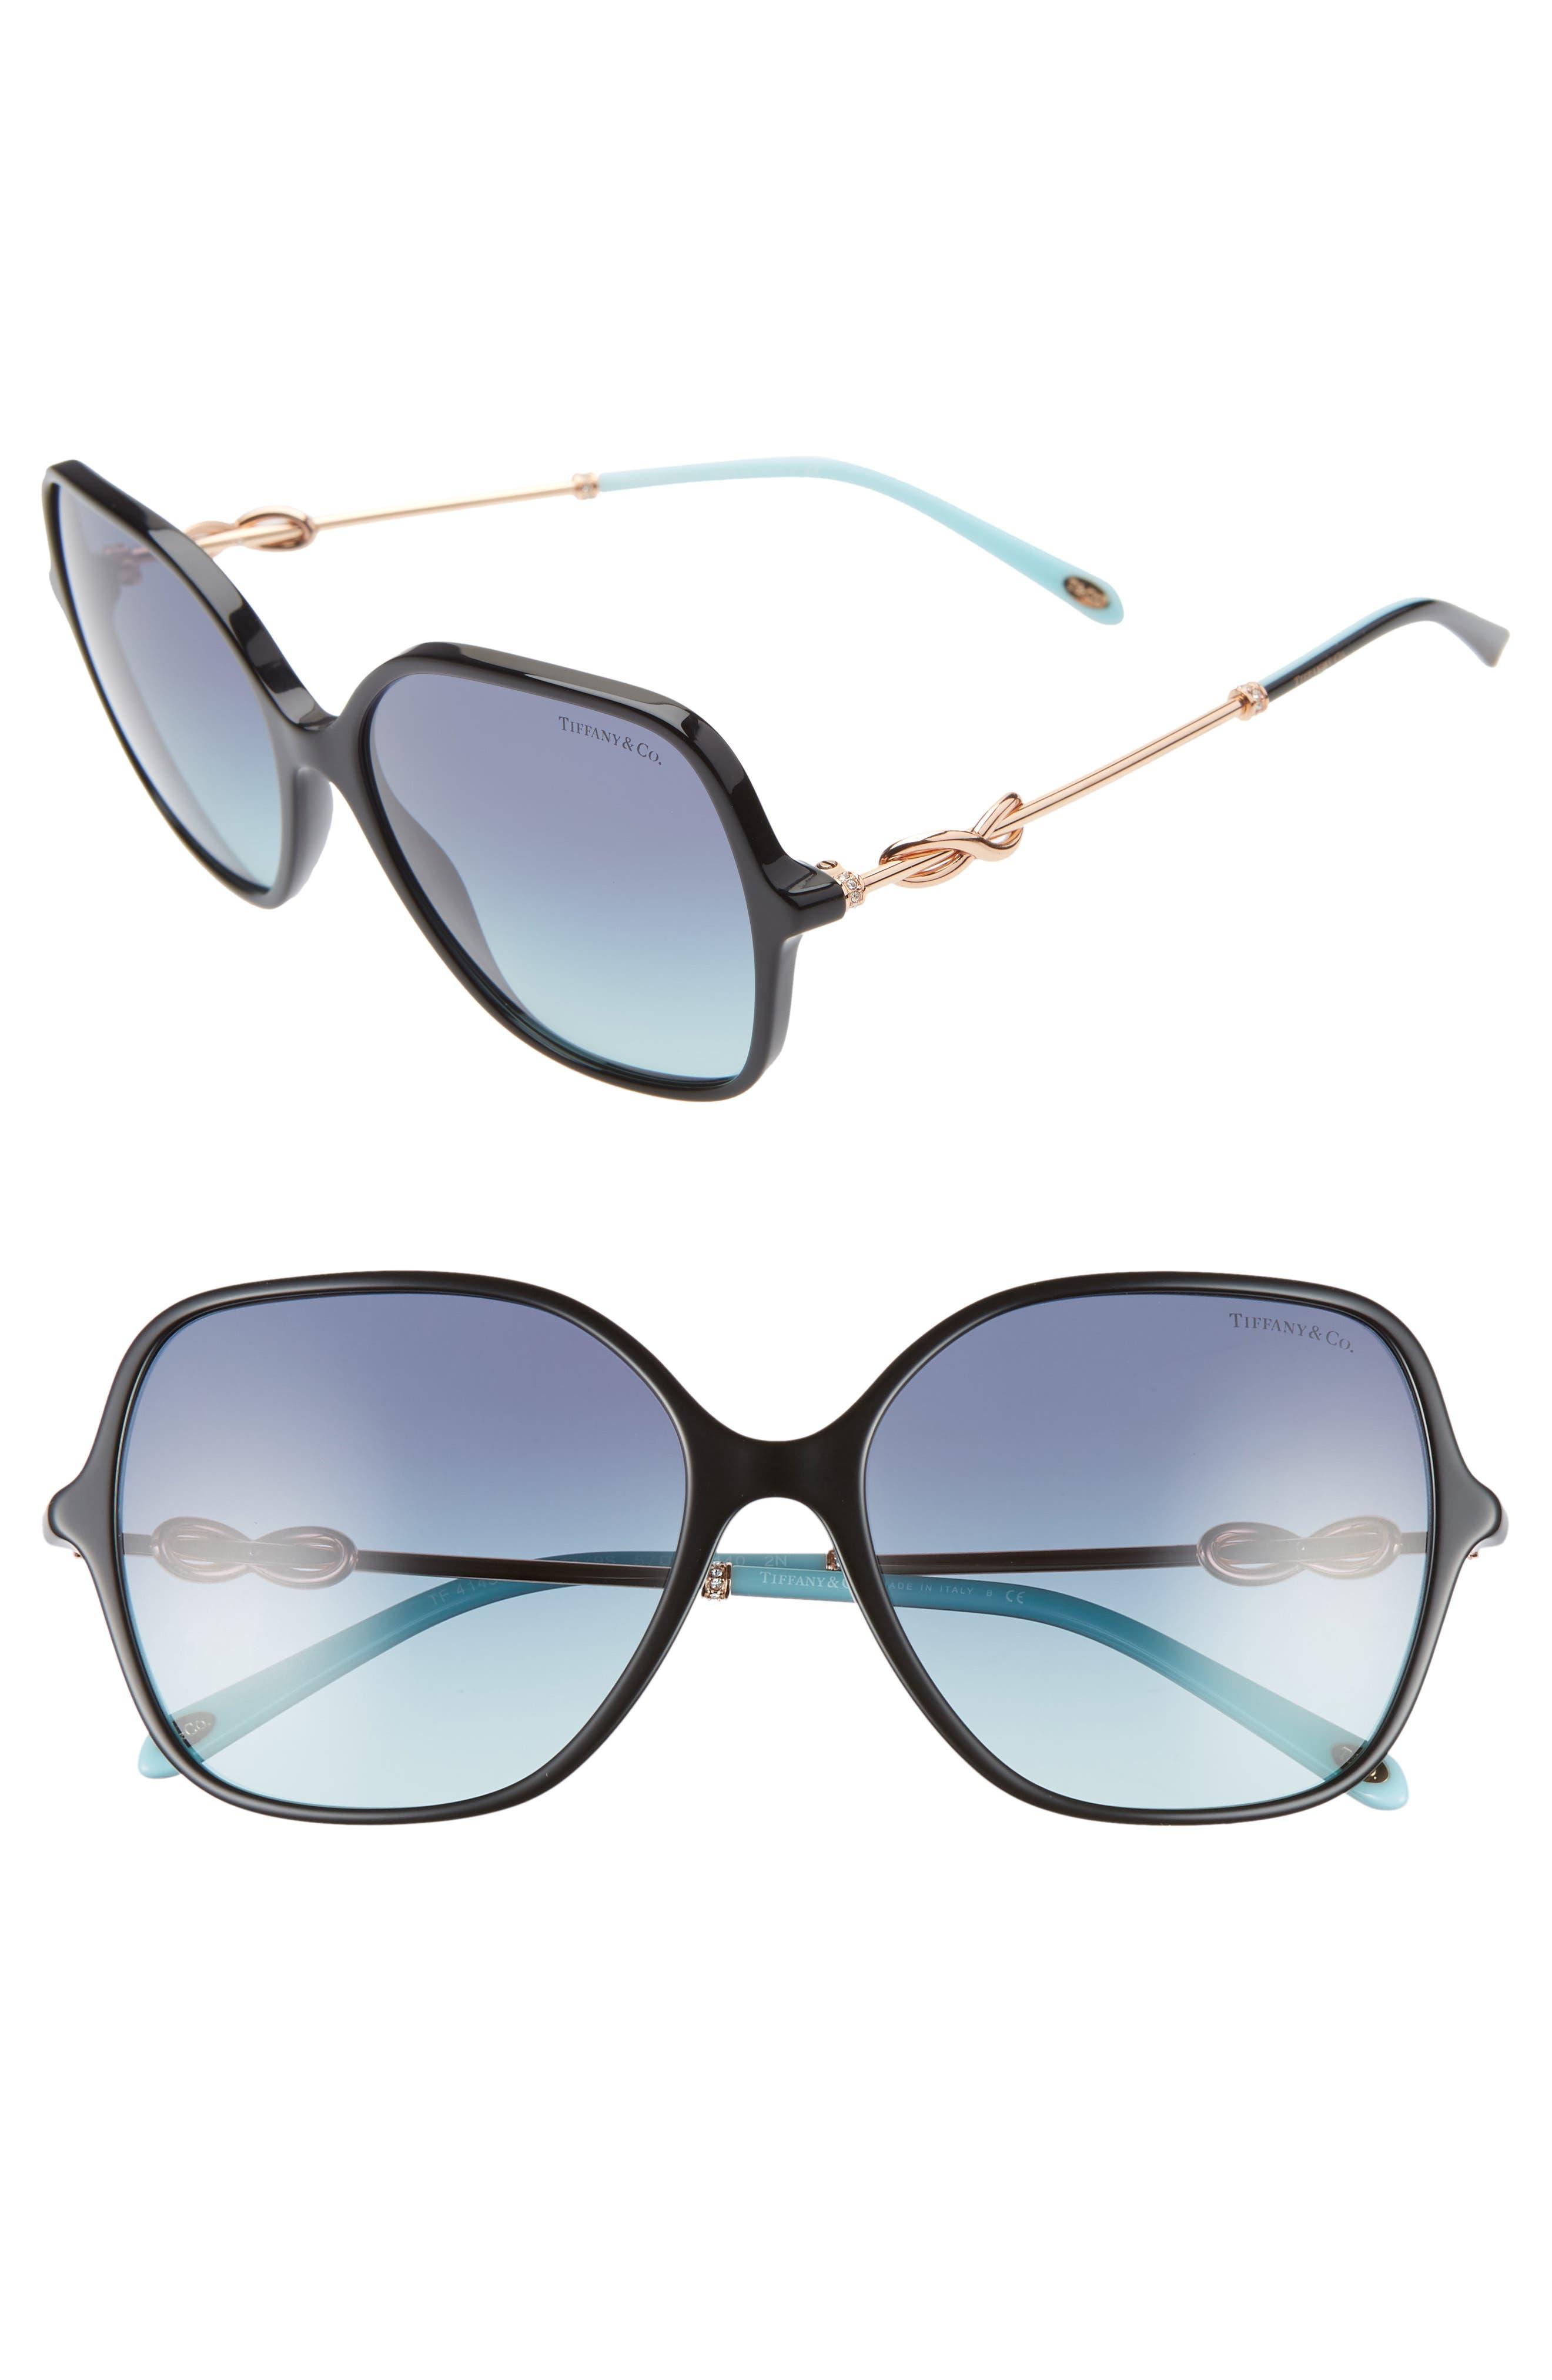 TIFFANY & CO., Tiffany 57mm Sunglasses, Main thumbnail 1, color, BLACK/ AZURE GRADIENT